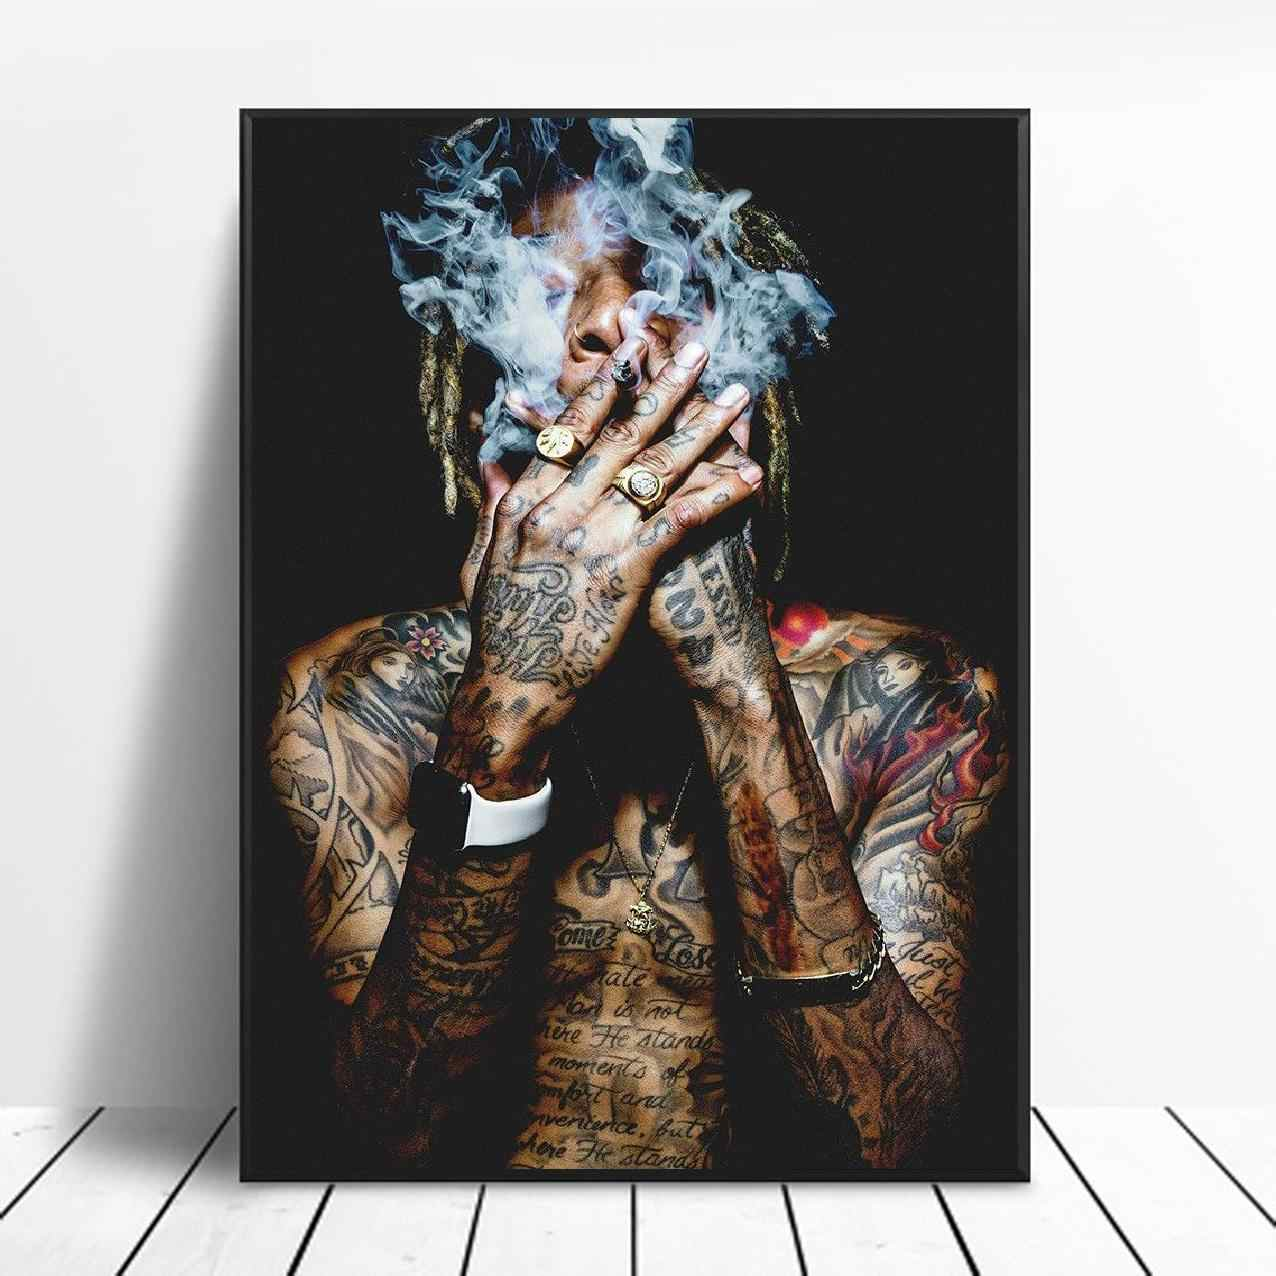 E-41 Wiz Khalifa Rapper 2018 Hip Hop Singer Music Fabric Poster Print